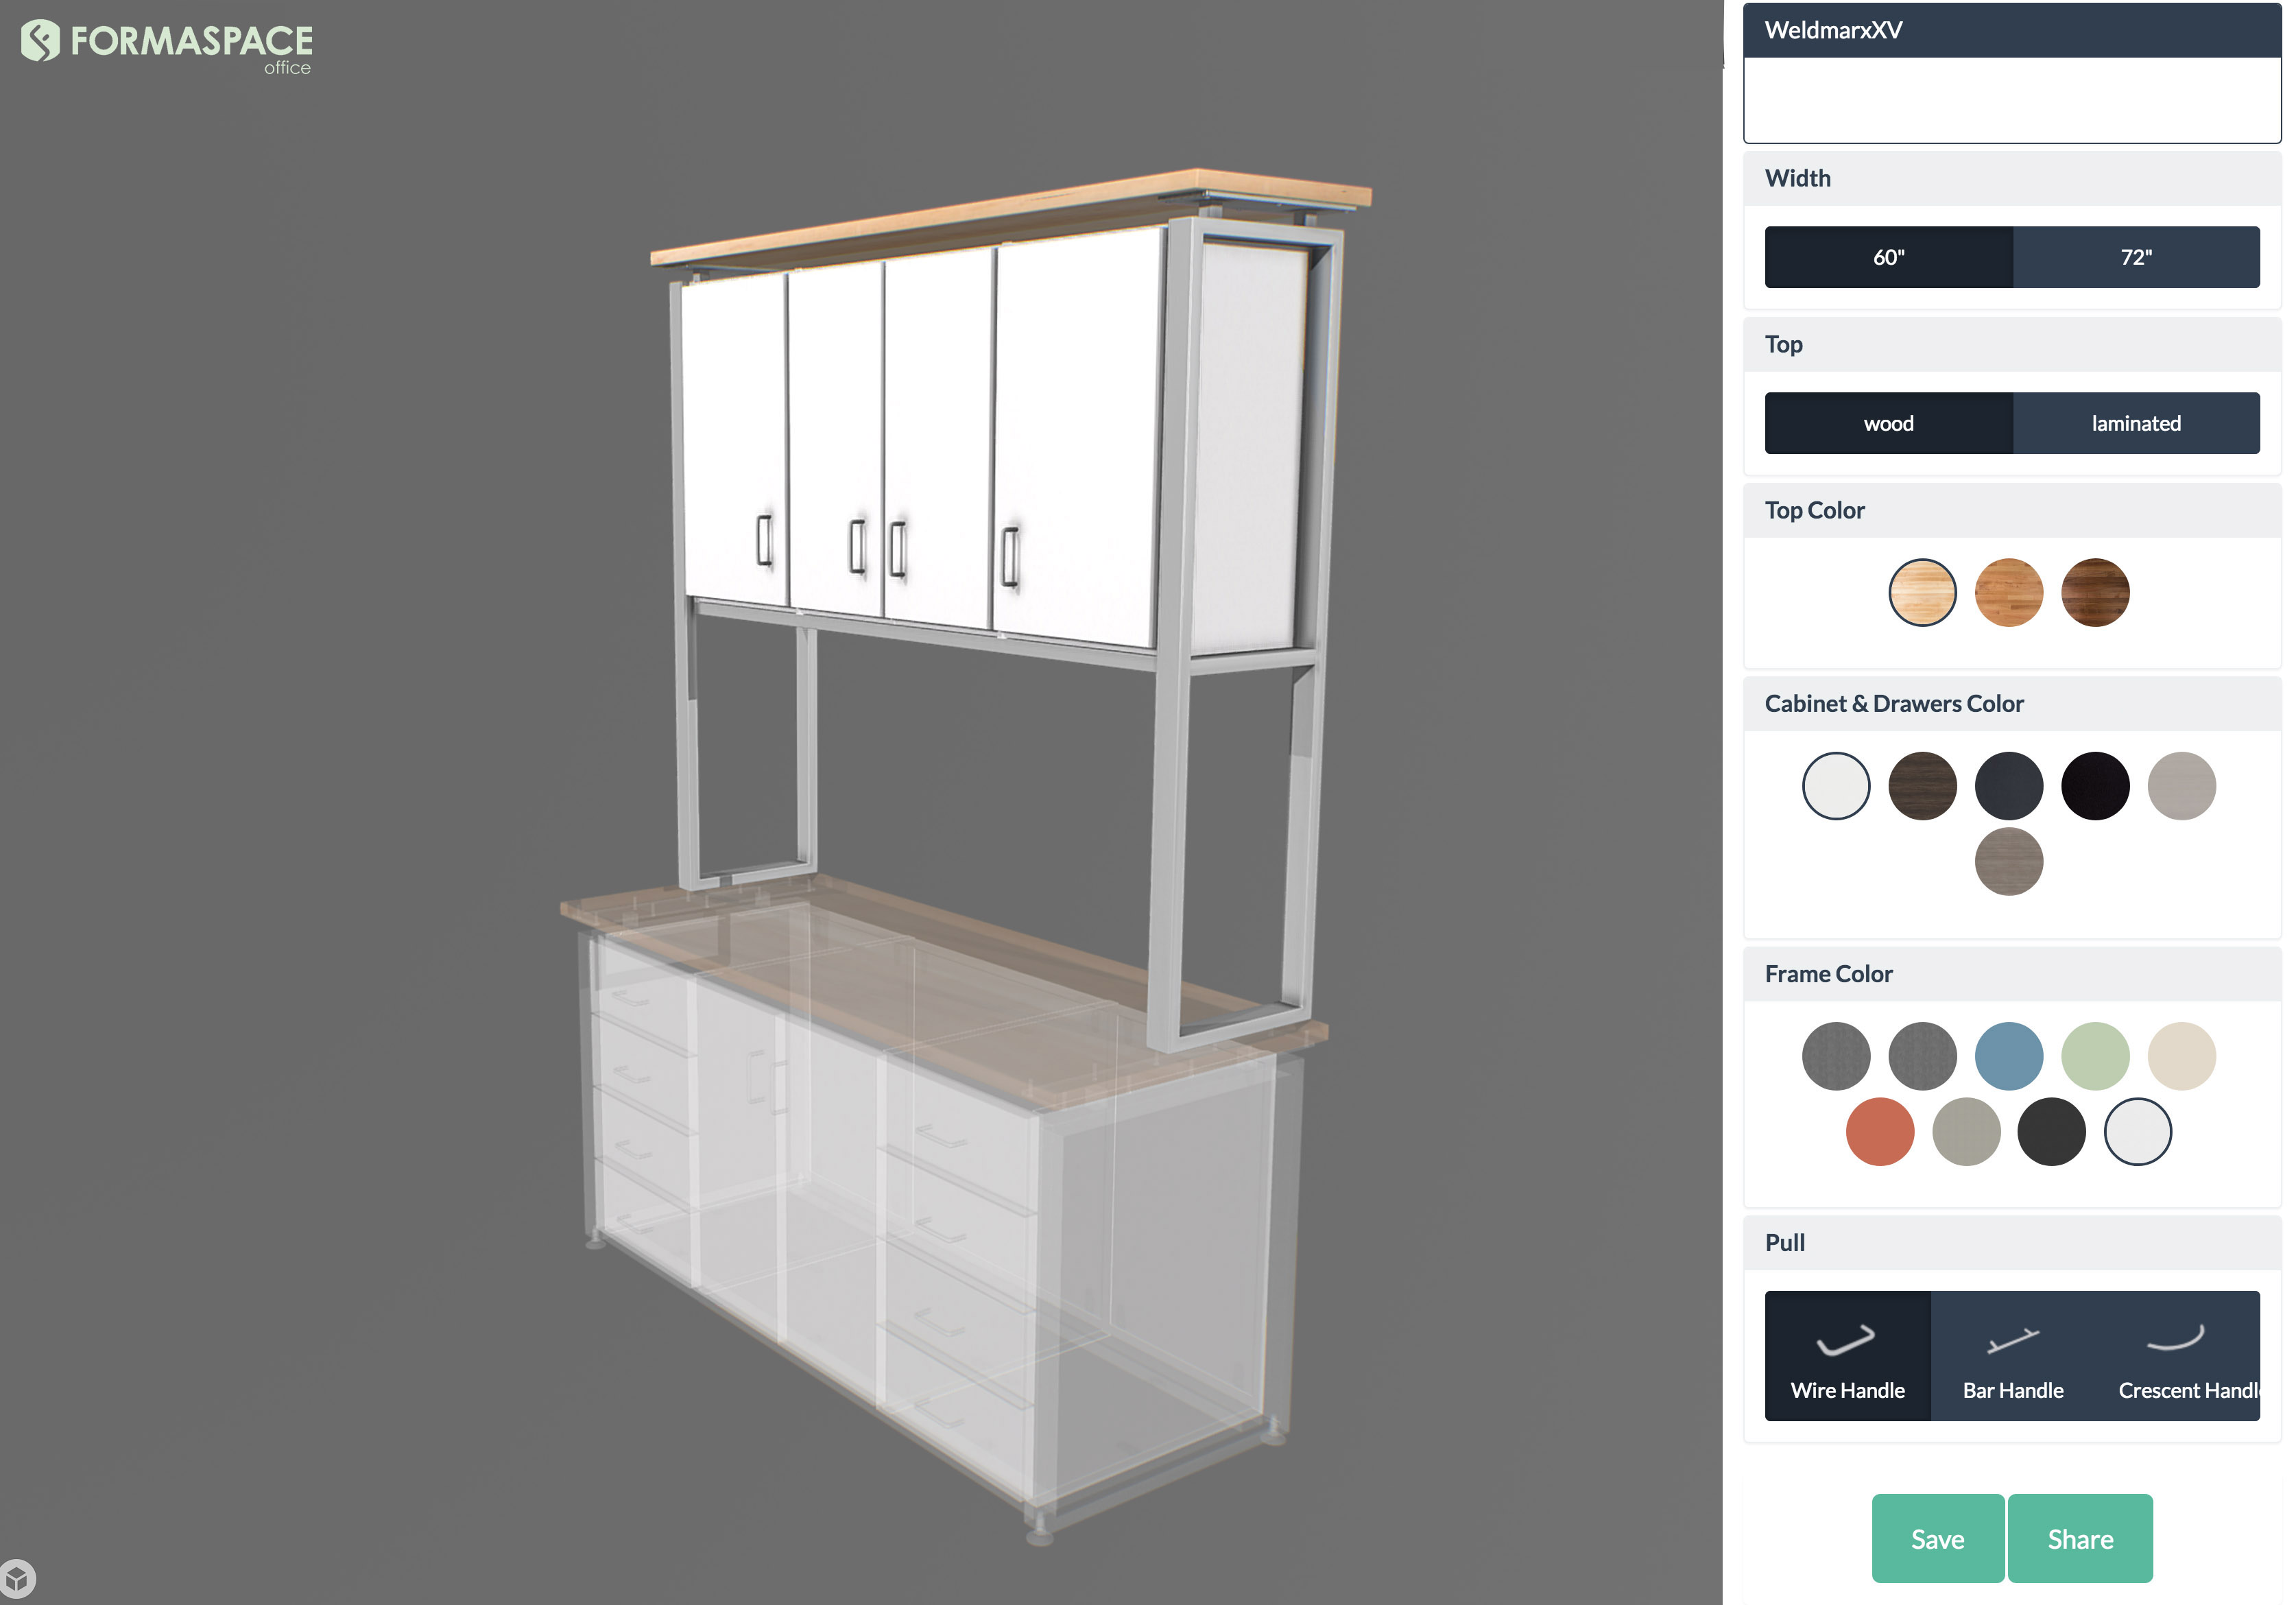 3D Configurator - Formaspace